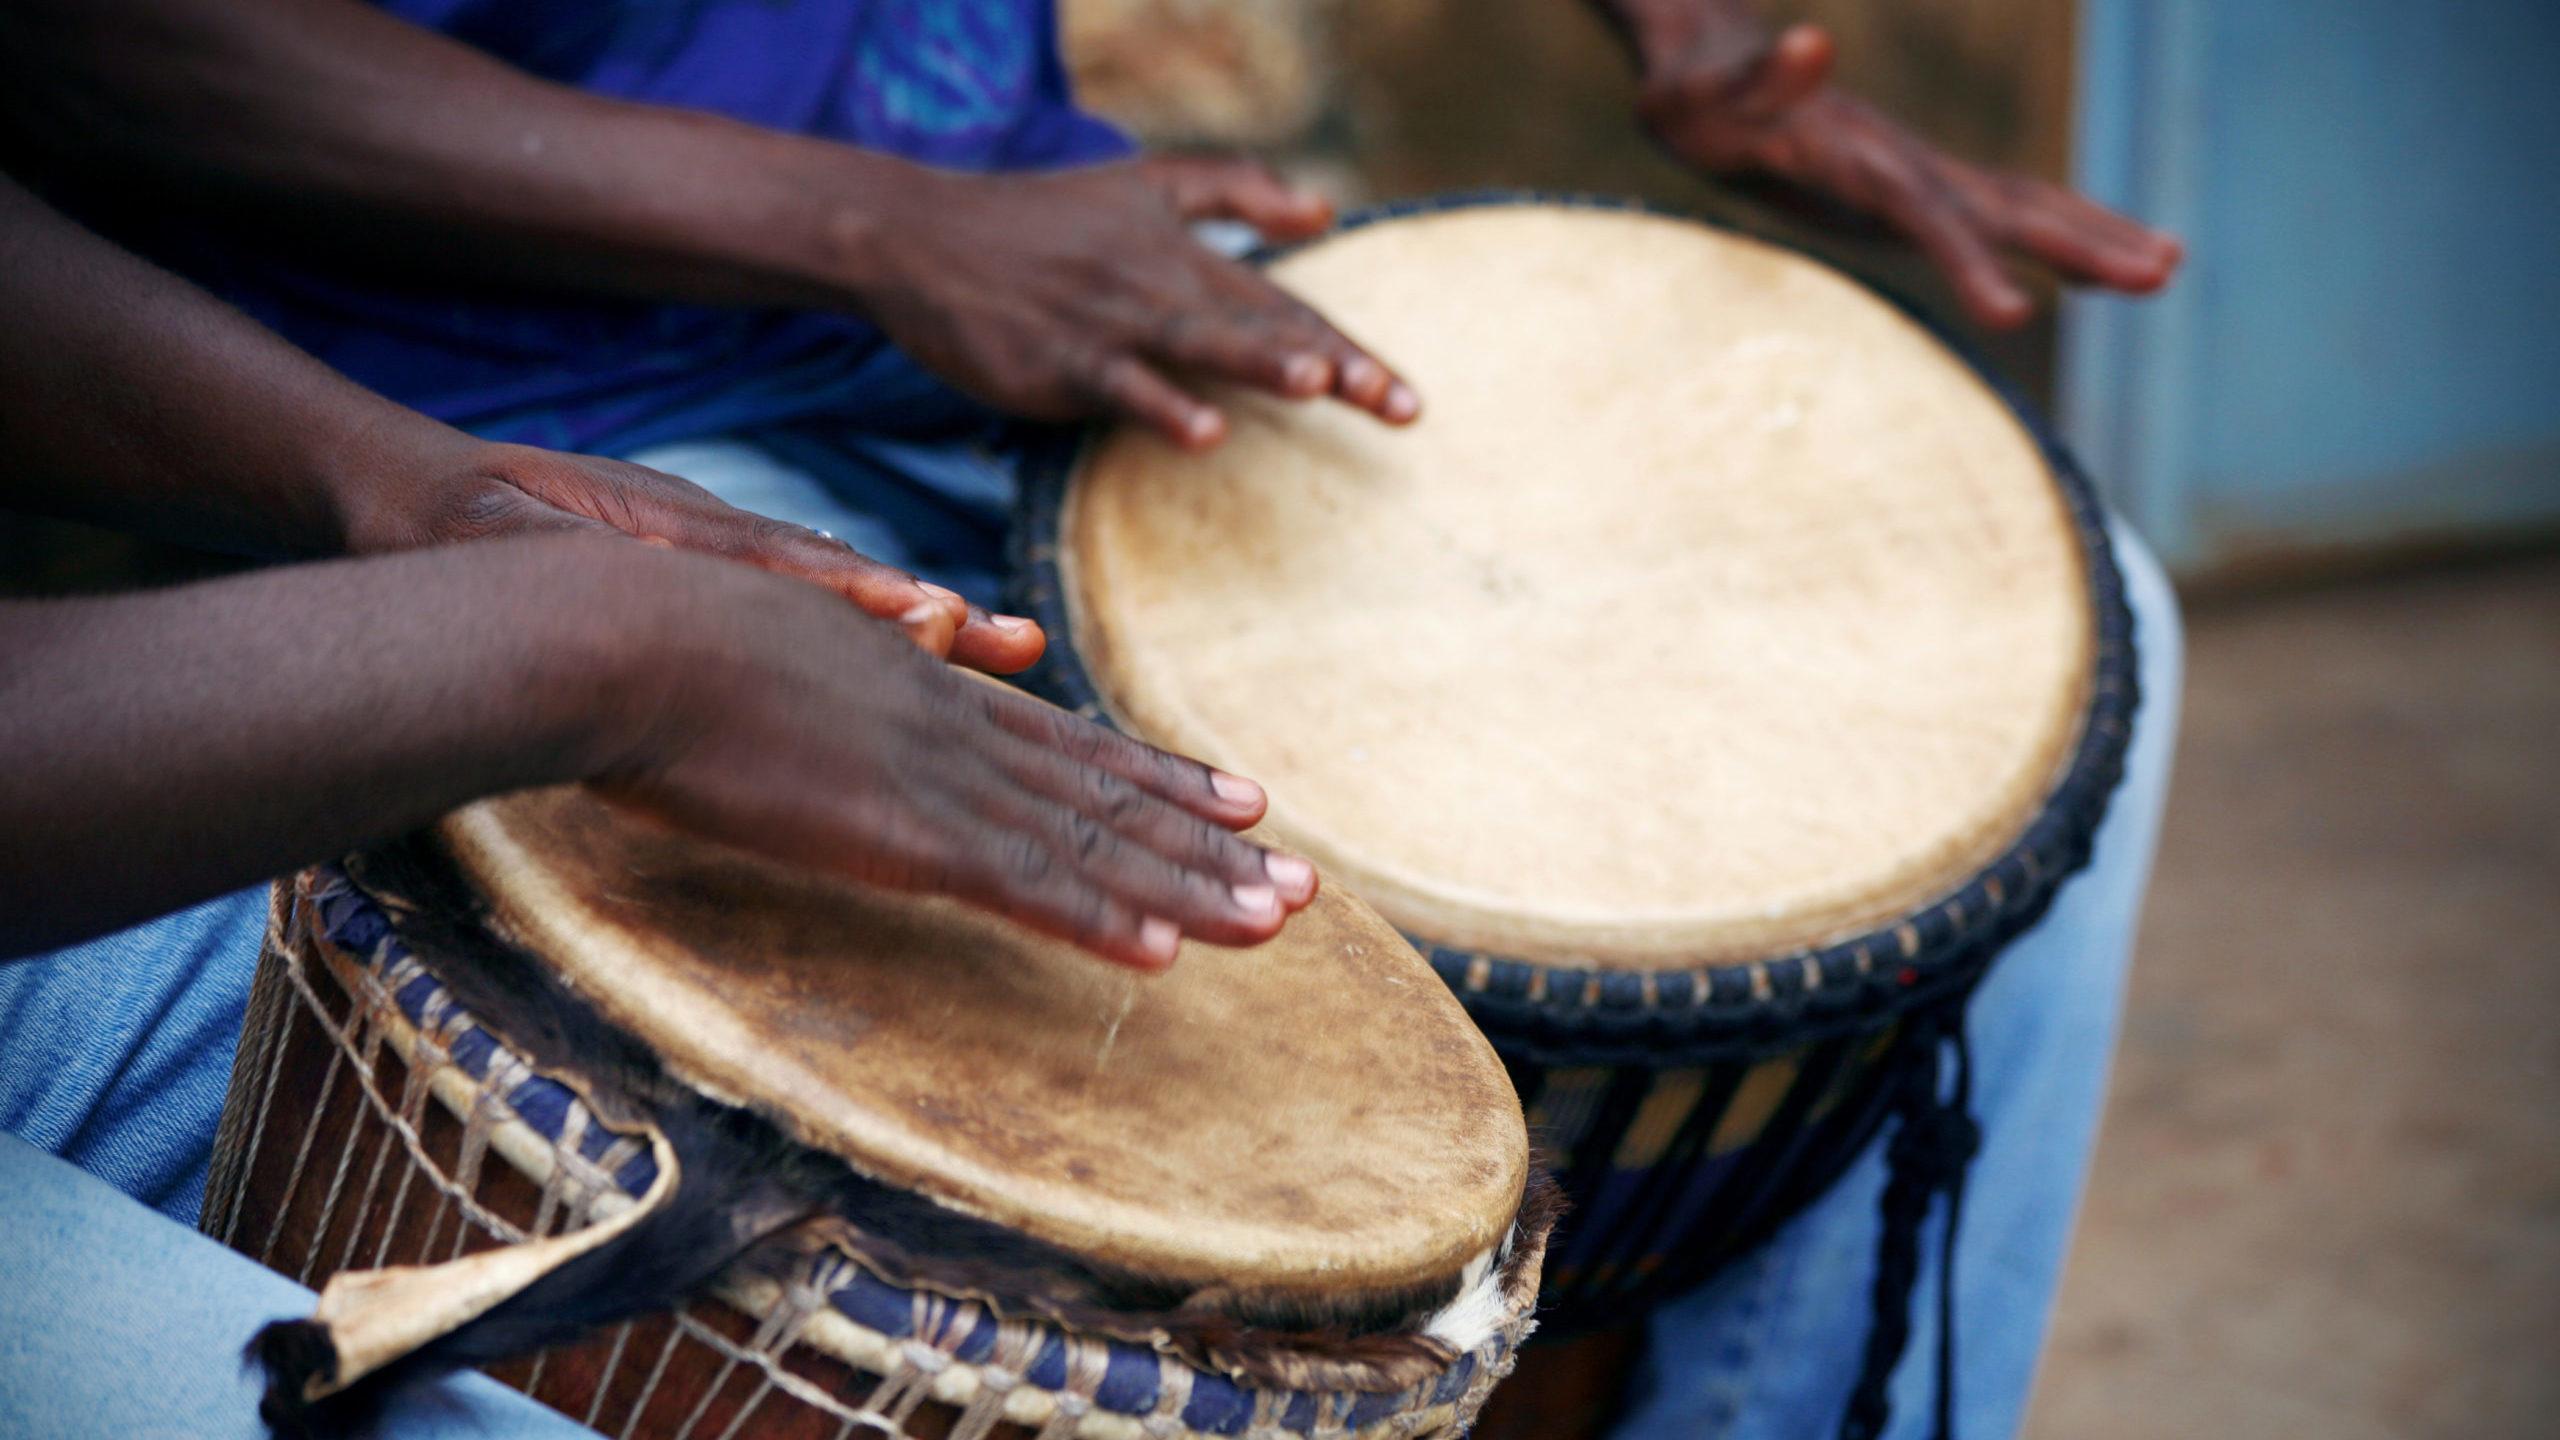 West African djembe drummers